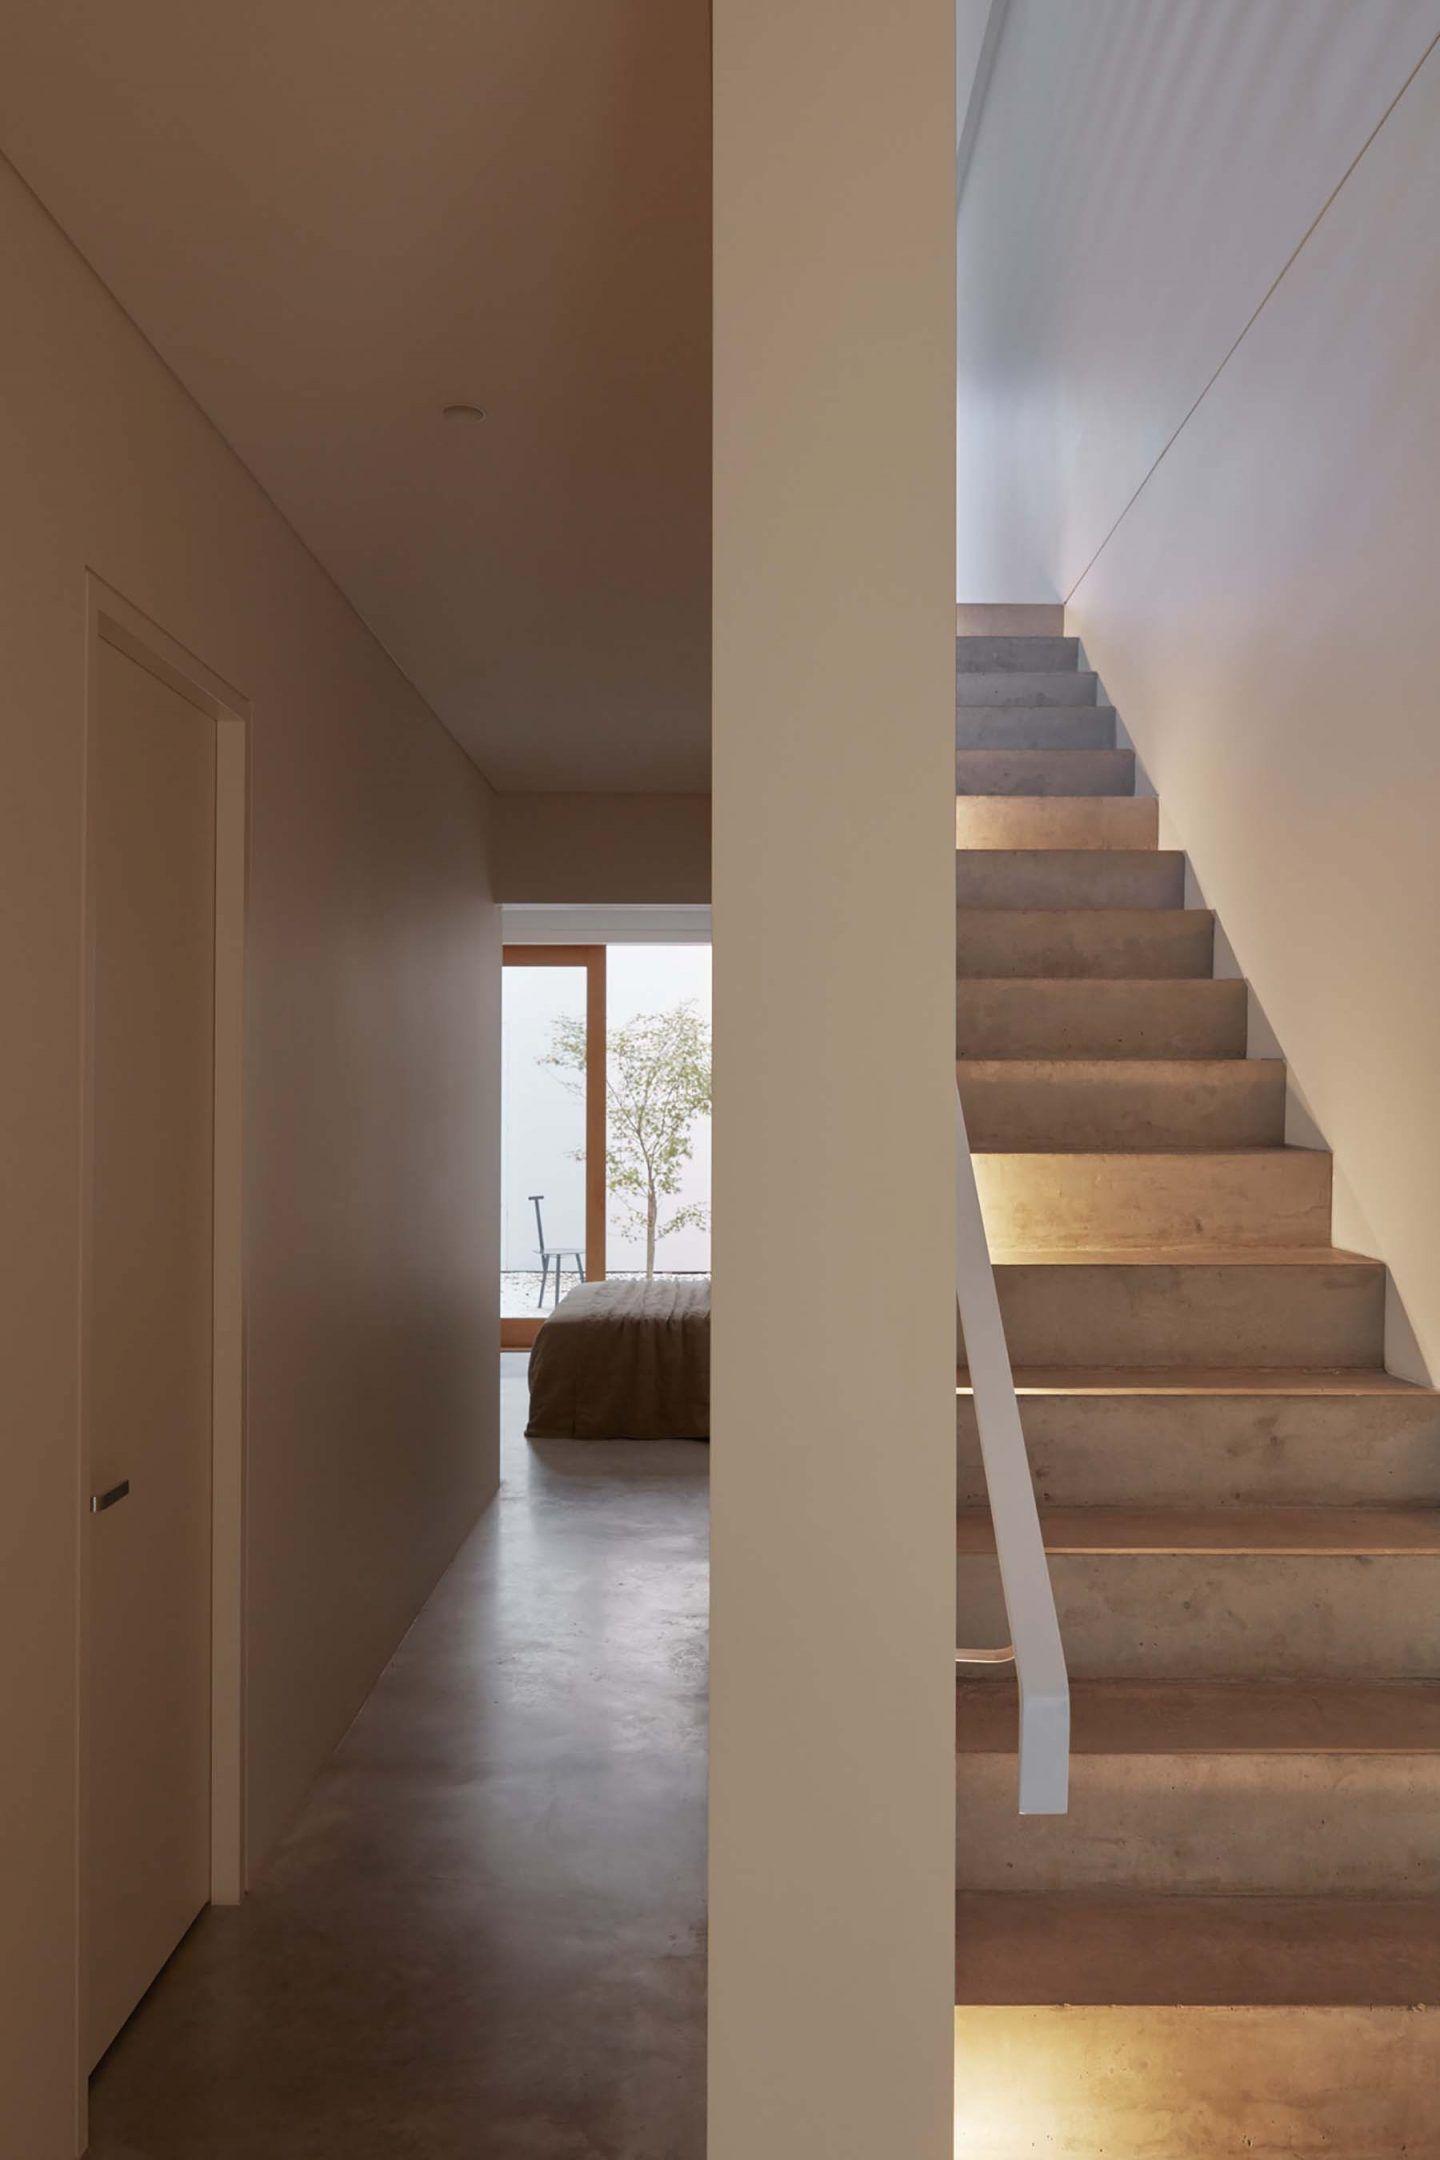 IGNANT-Architecture-Oliver-du-Puy-Architects-Skinny-House-16